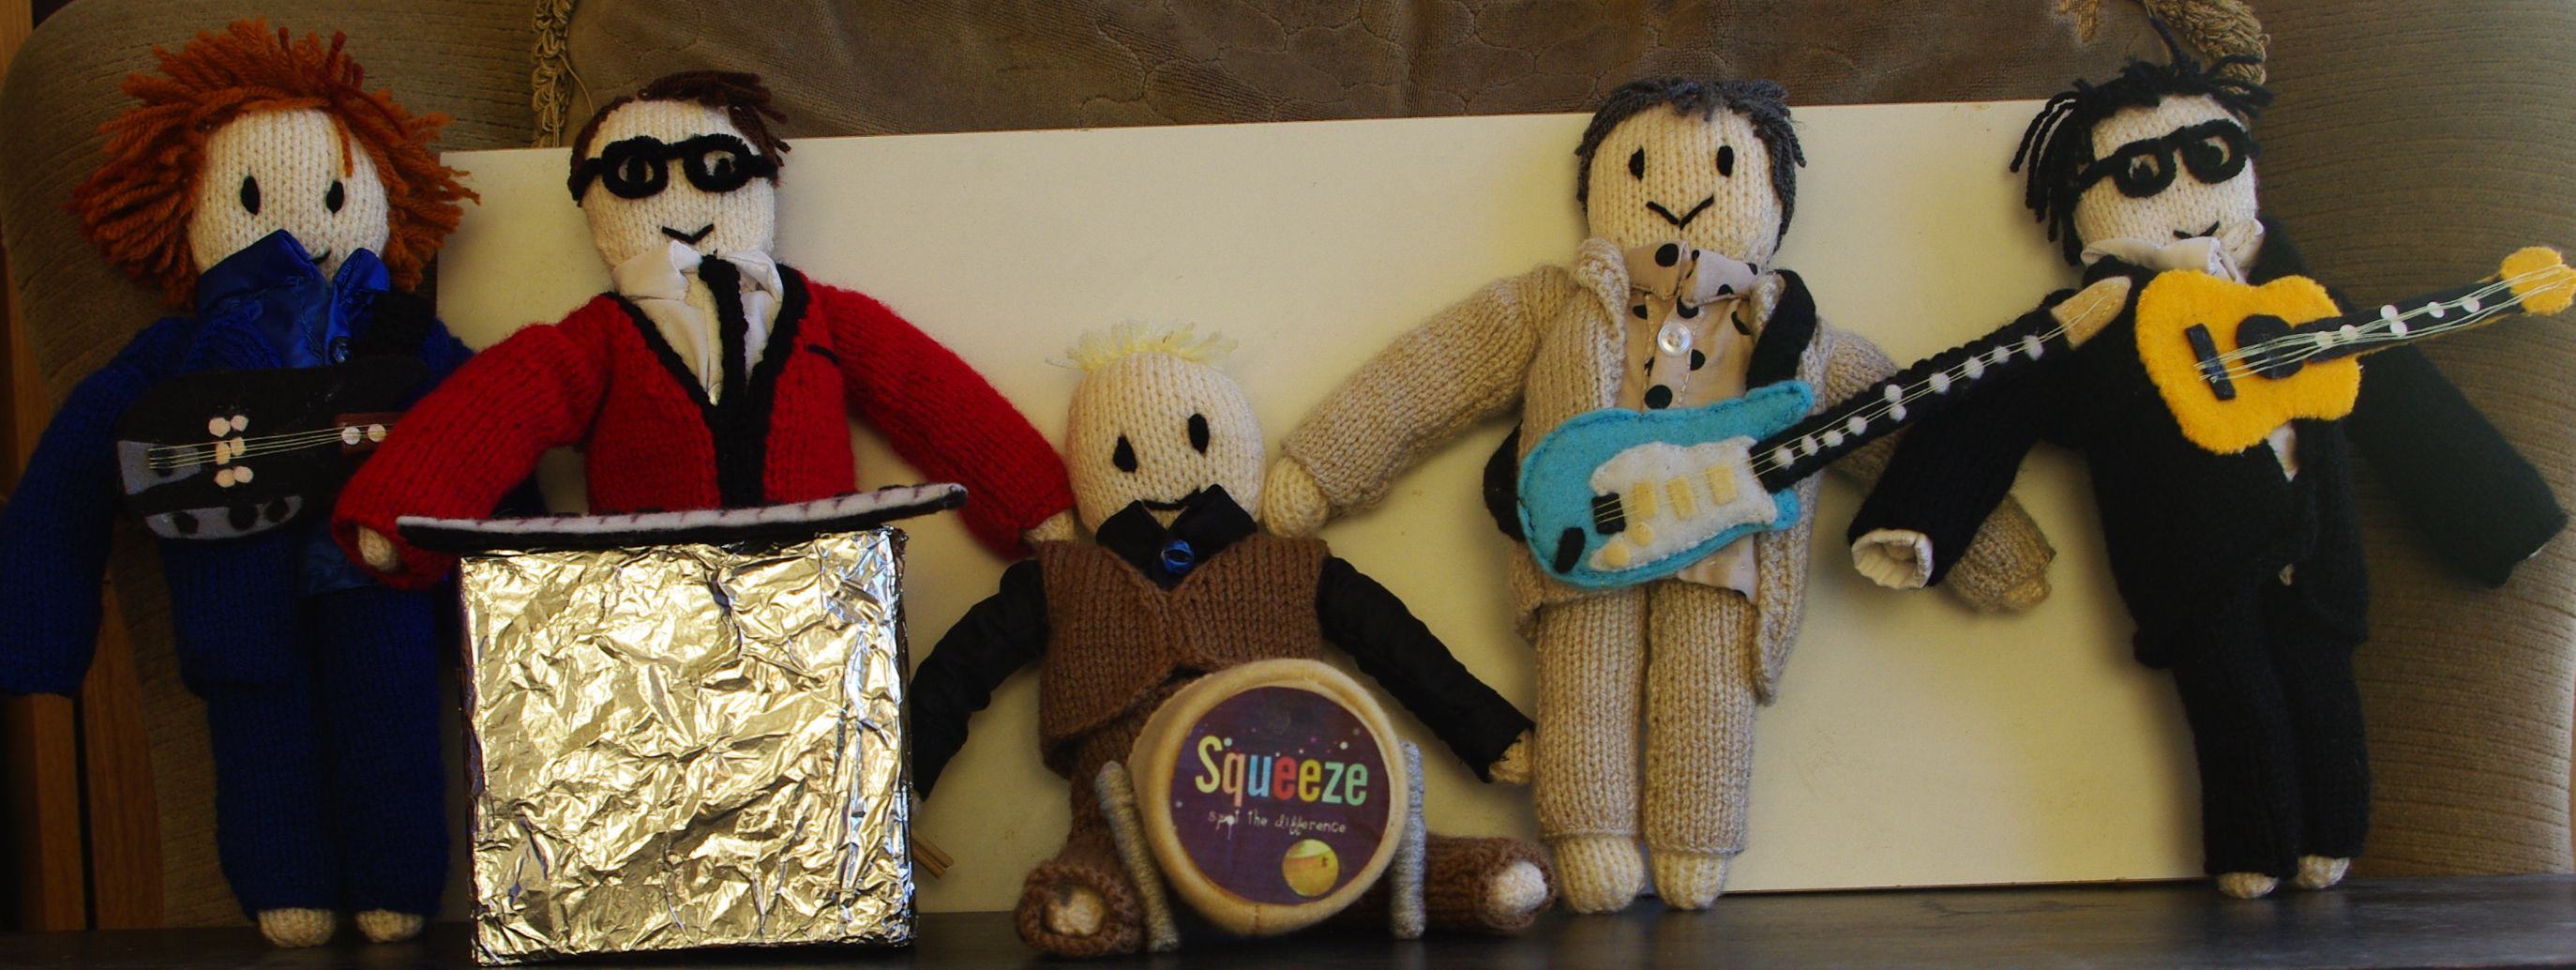 Jackie Winn Squeeze dolls